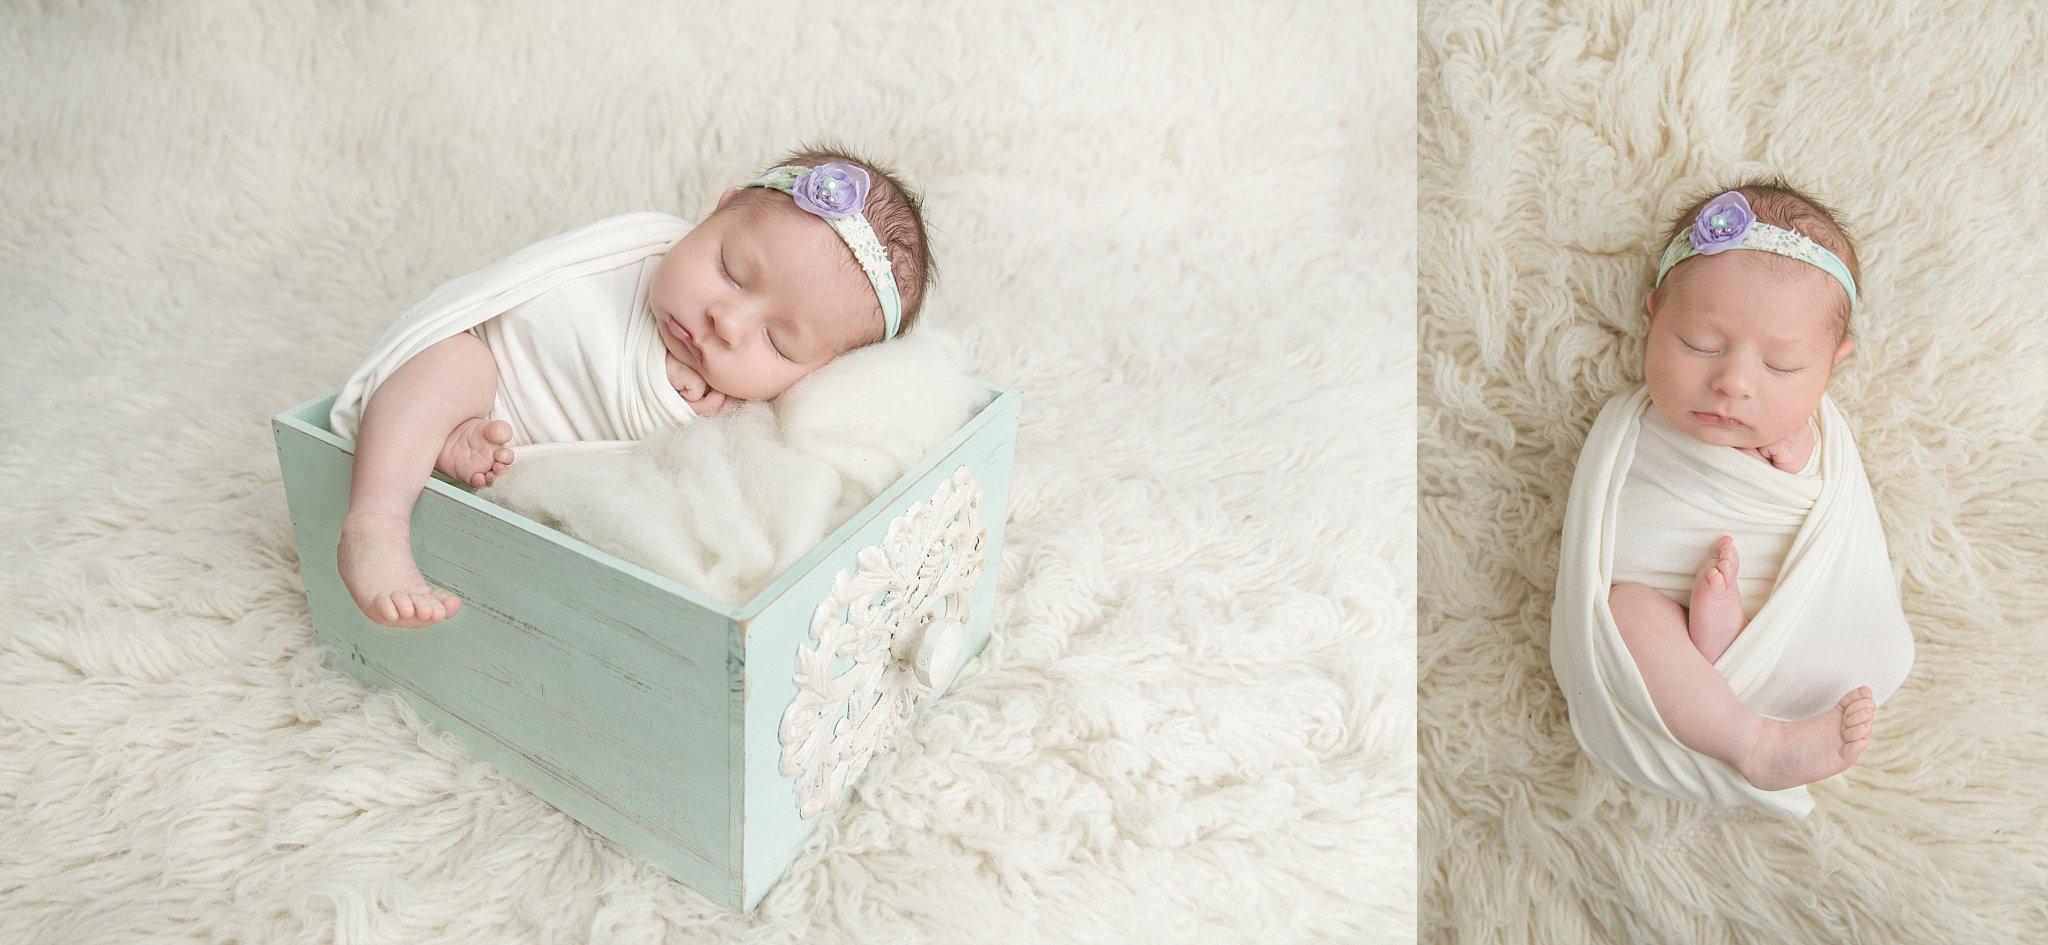 st-louis-newborn-photographer-baby-girl-in-mint-box-with-cream-fur.jpg